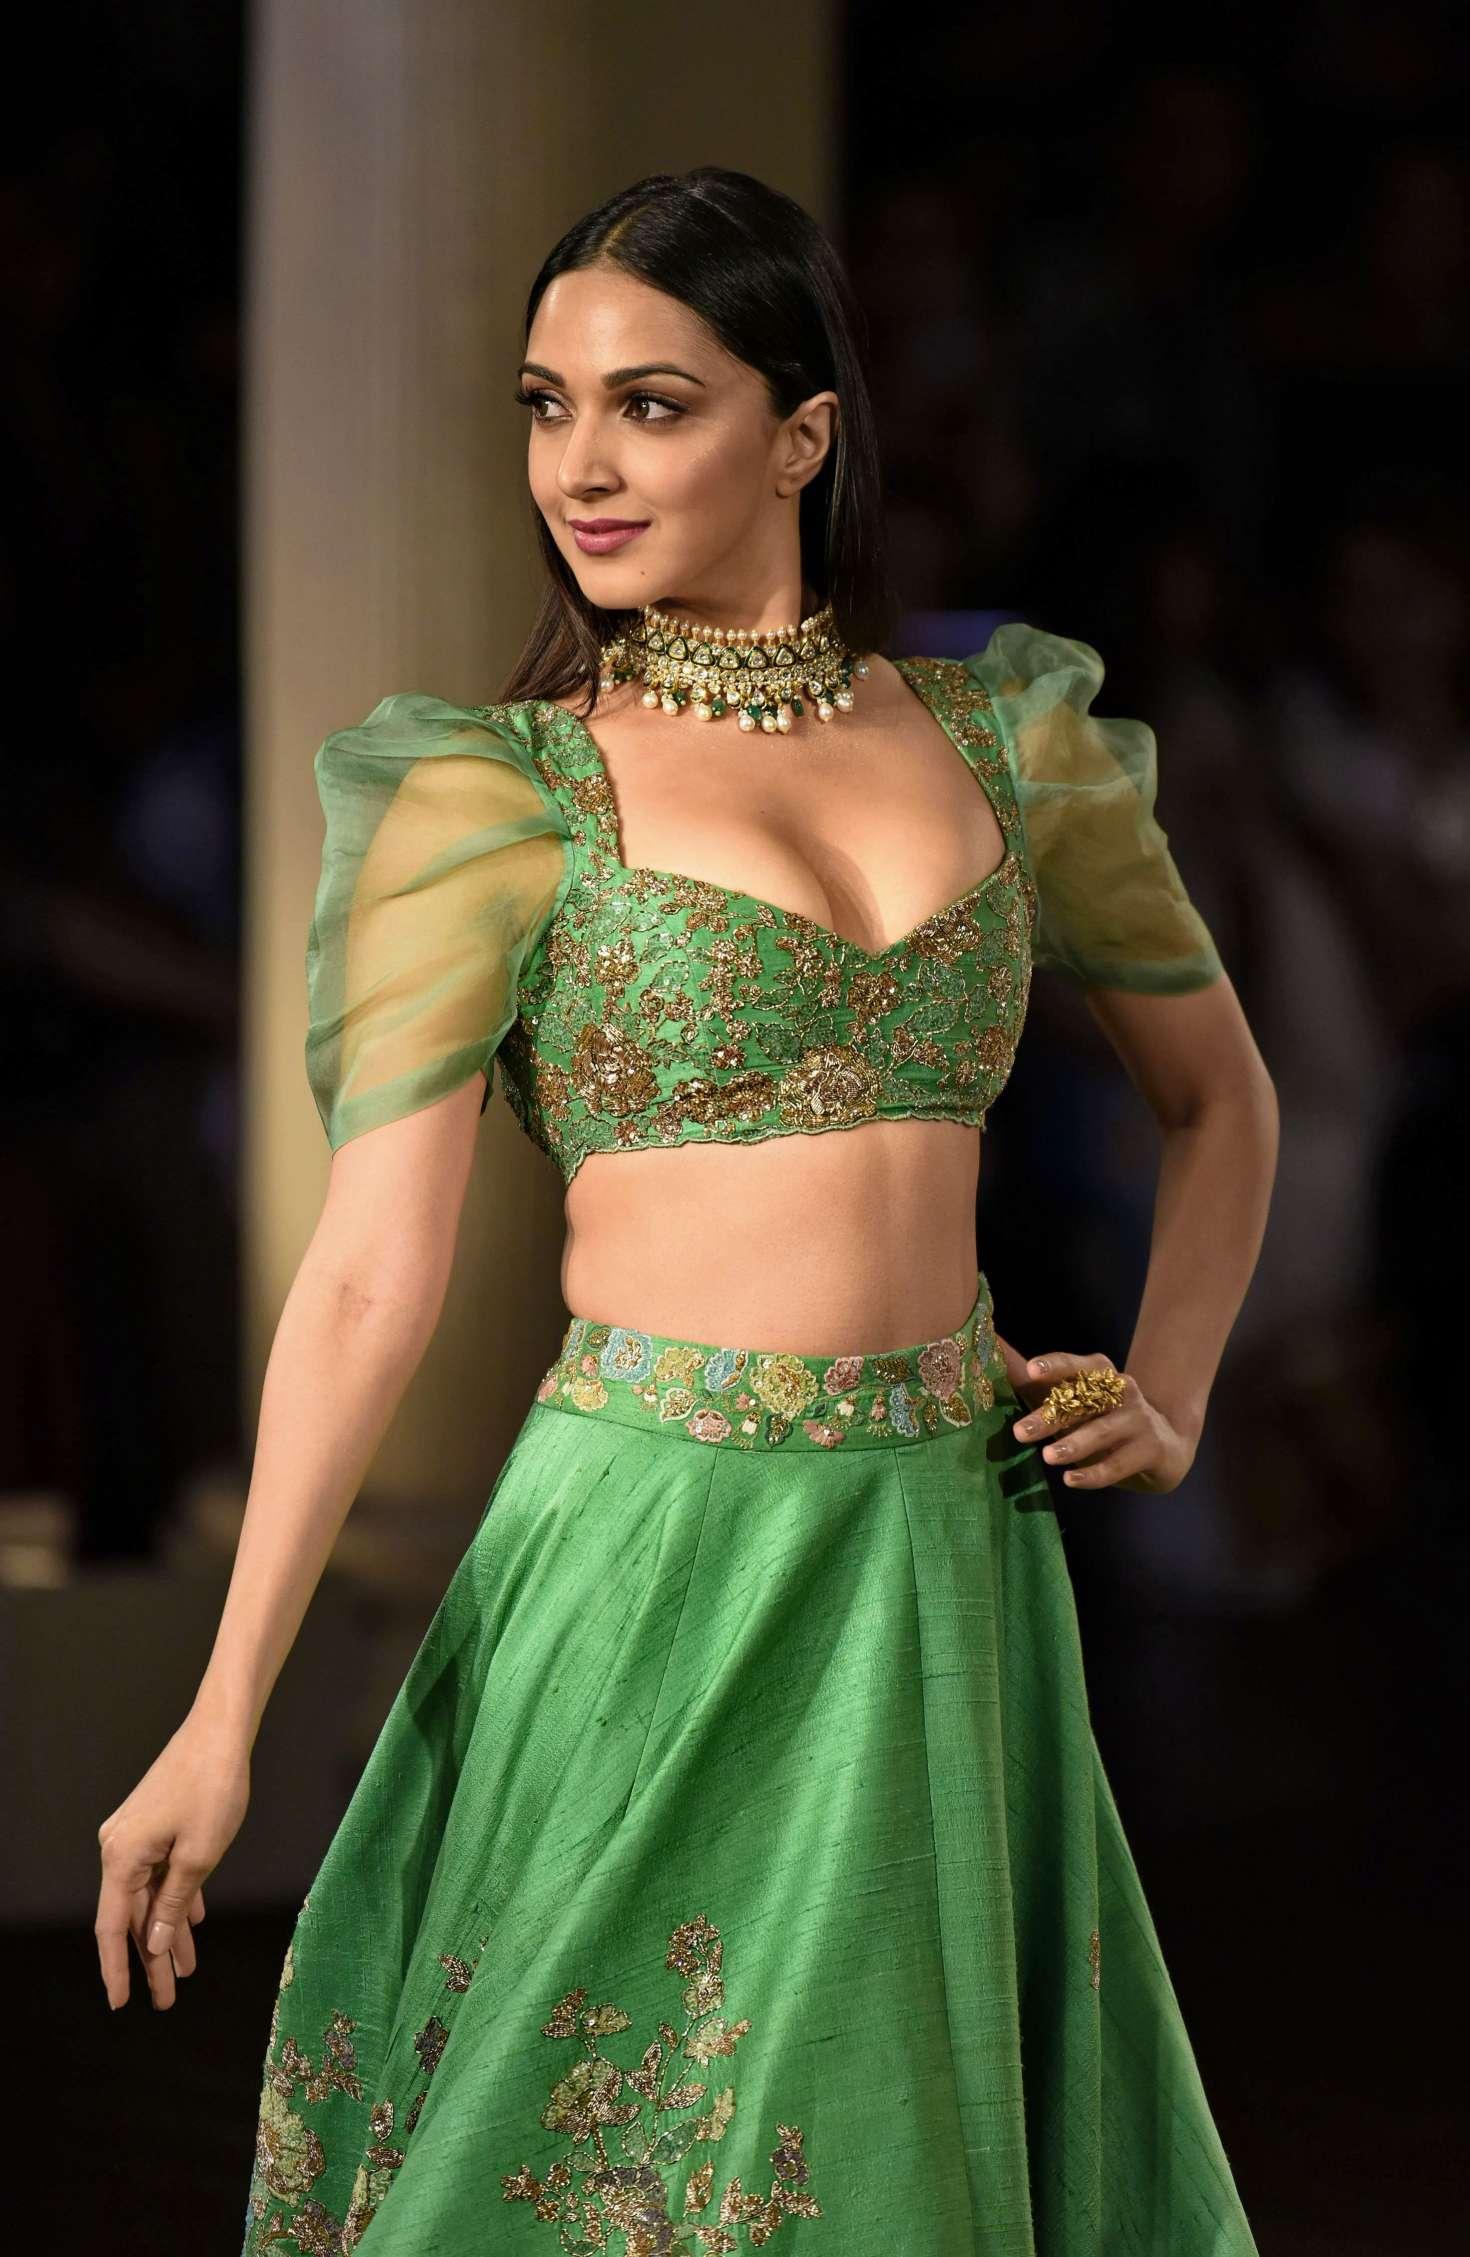 Kiara Advani naked (32 foto and video), Ass, Fappening, Twitter, panties 2020